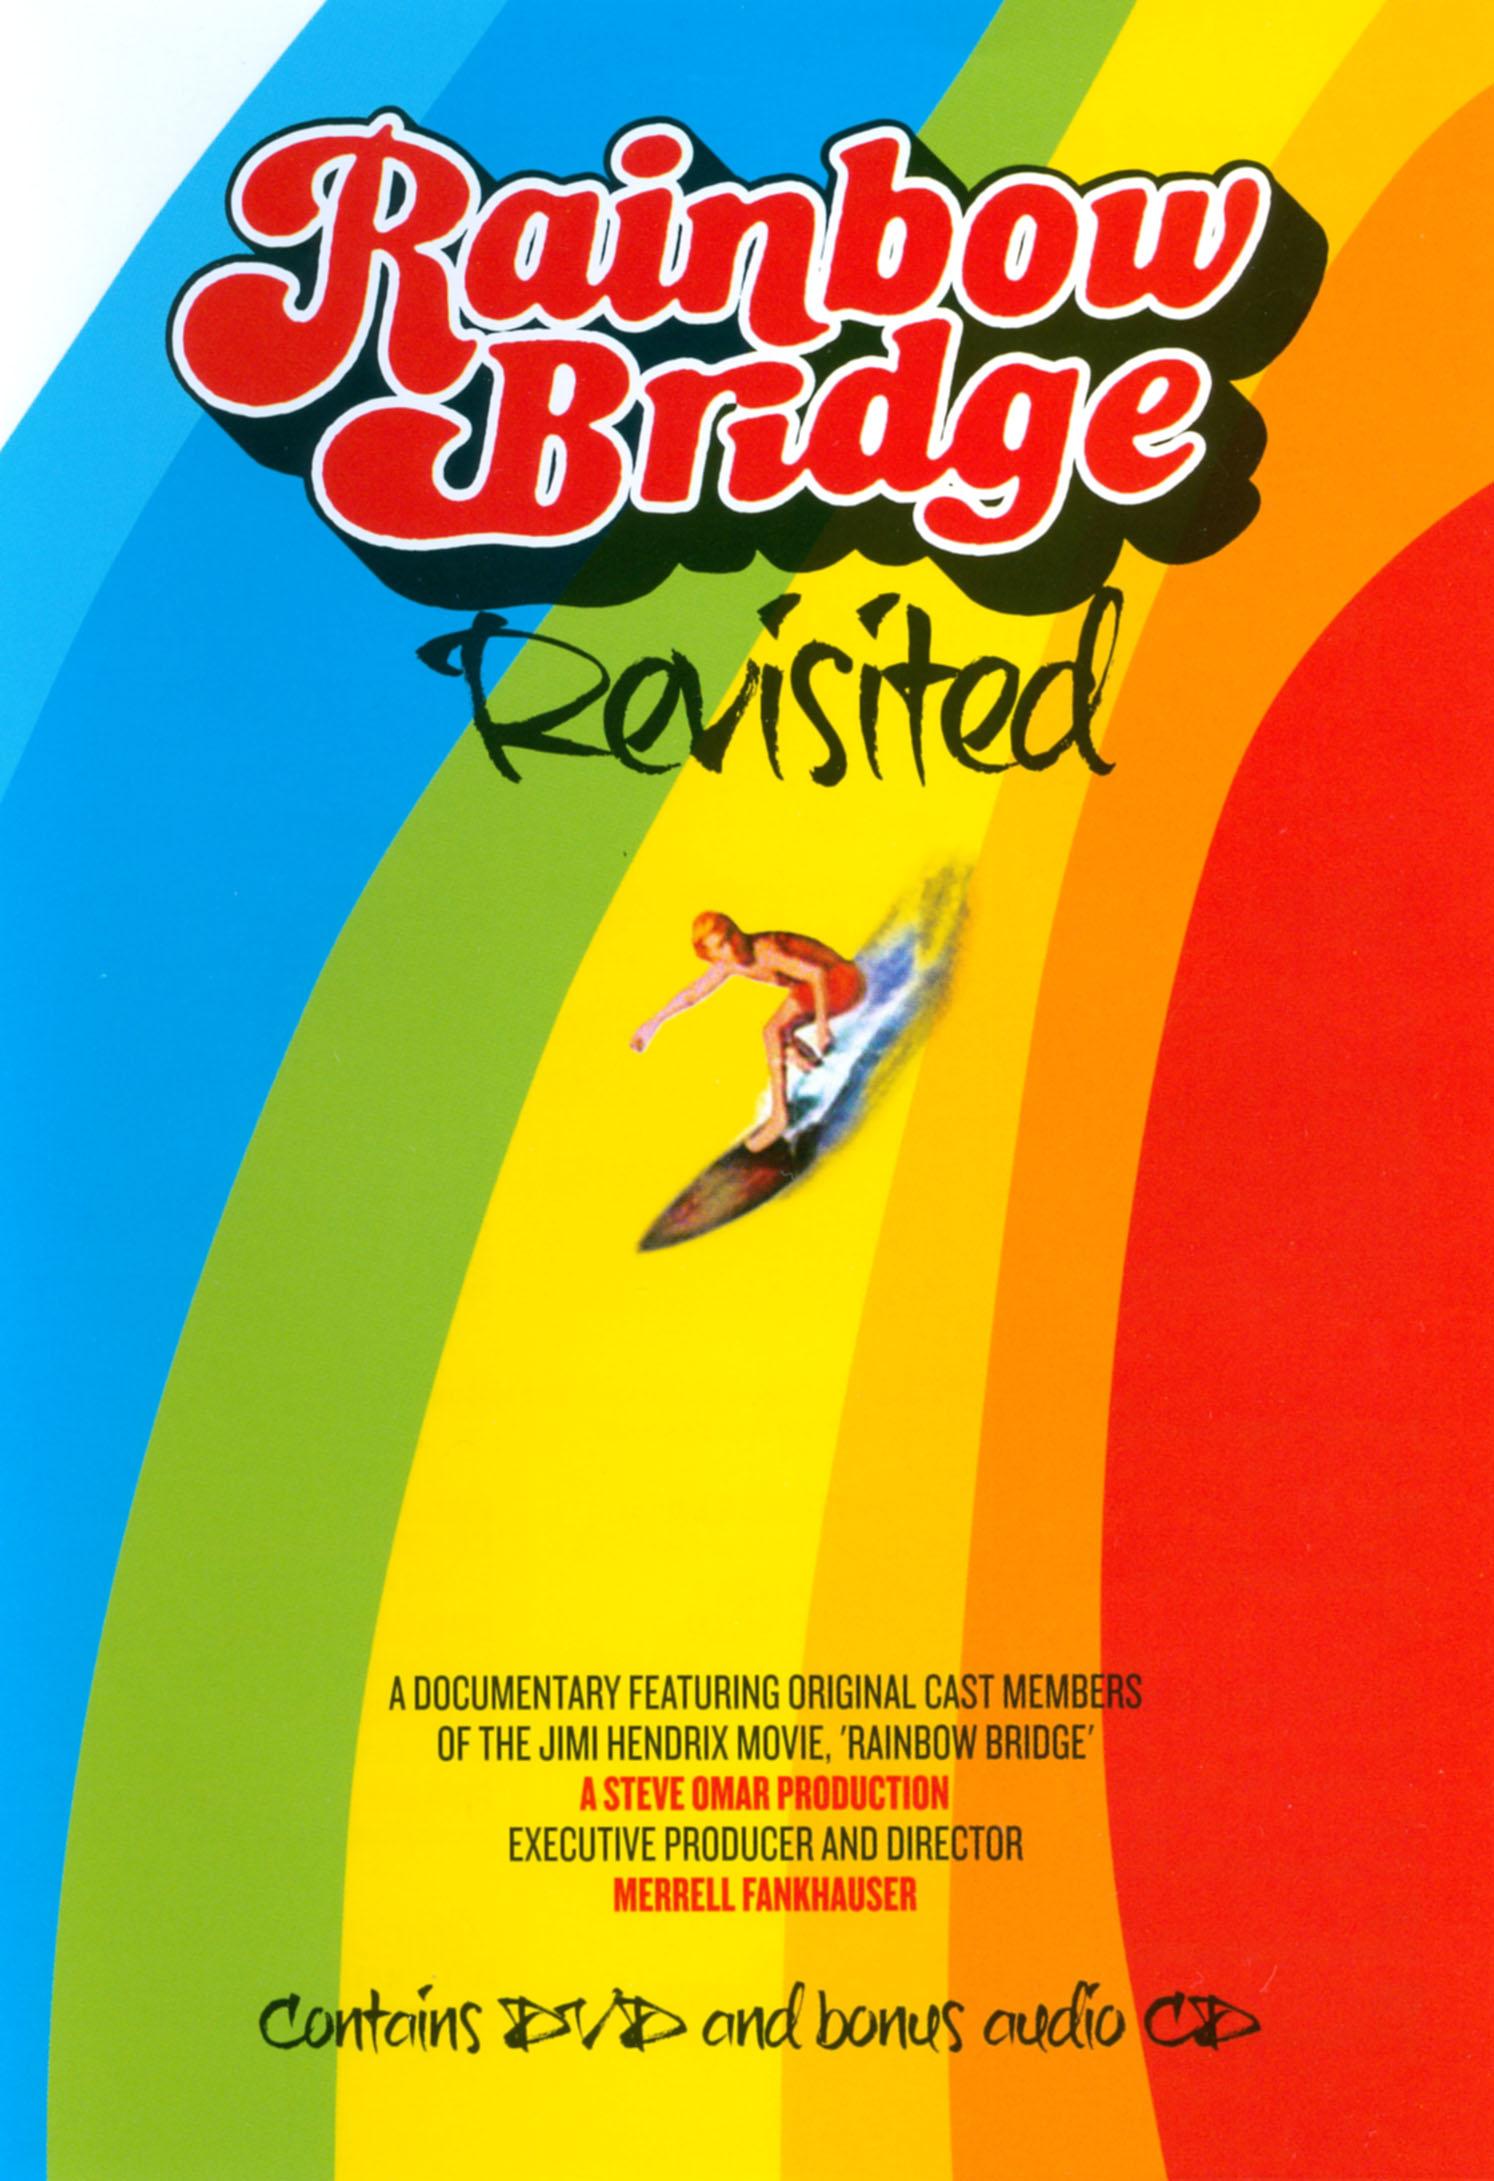 Rainbow Bridge: Revisited